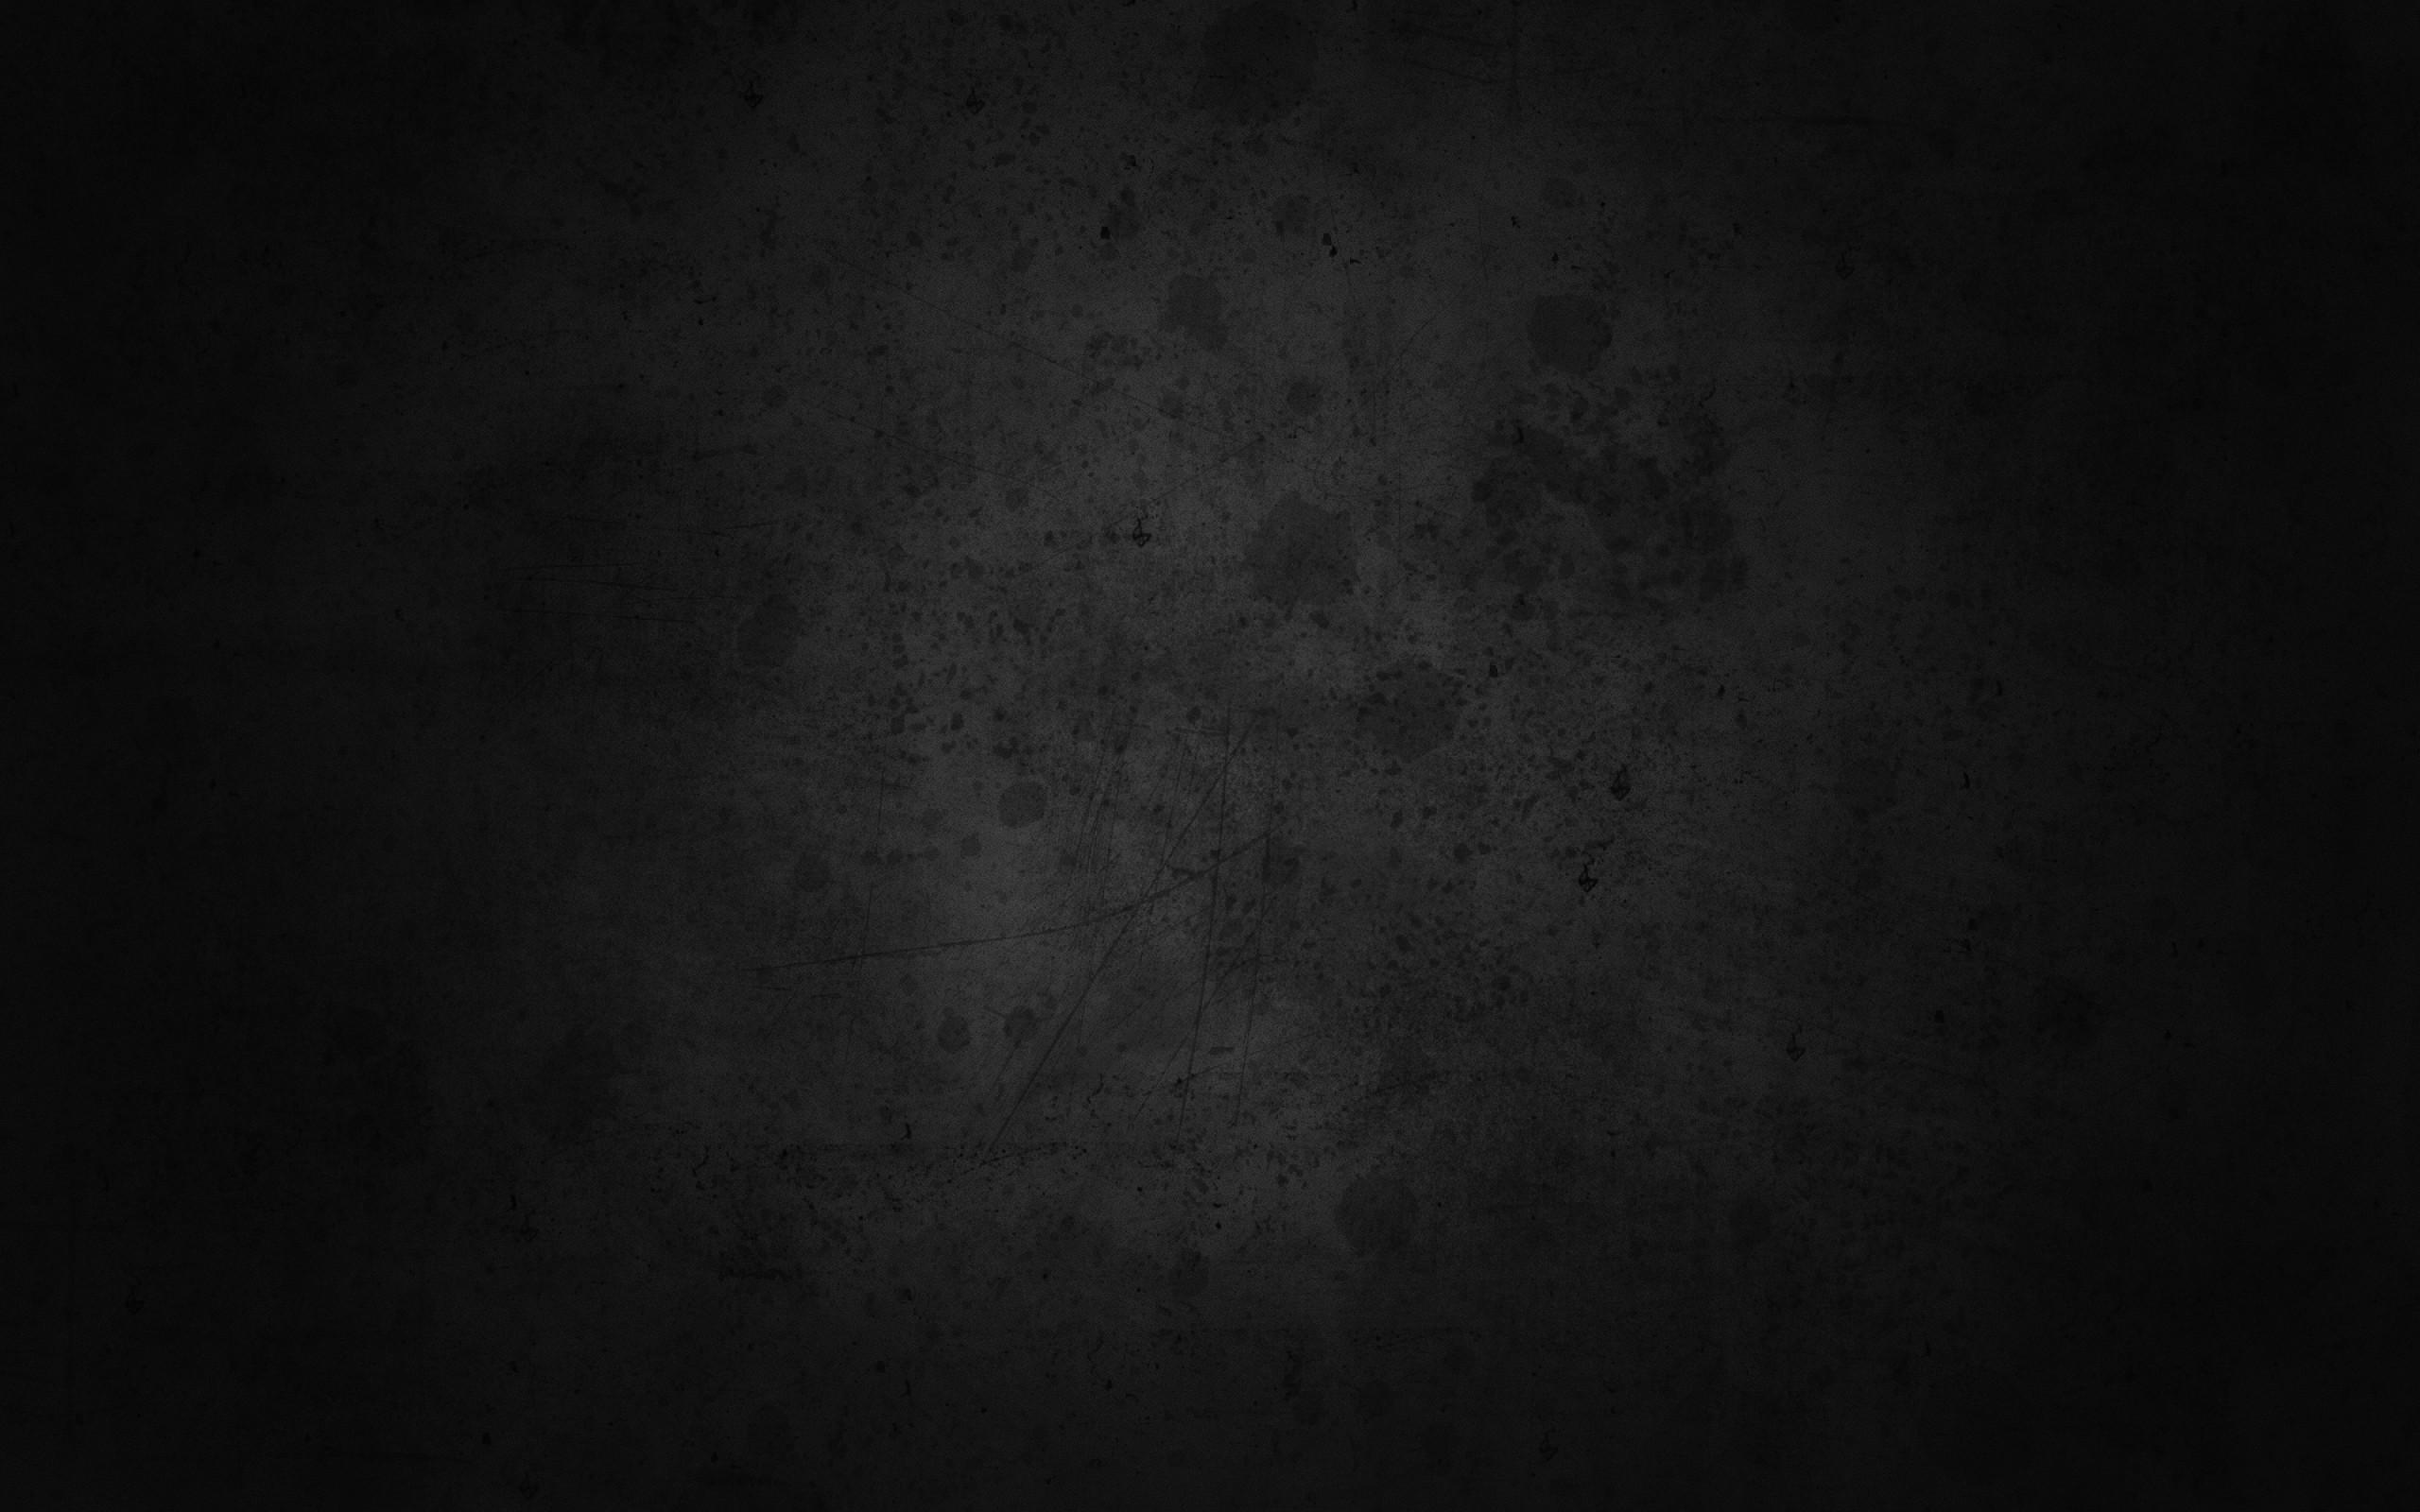 Plain Black Wallpaper (71 Wallpapers)